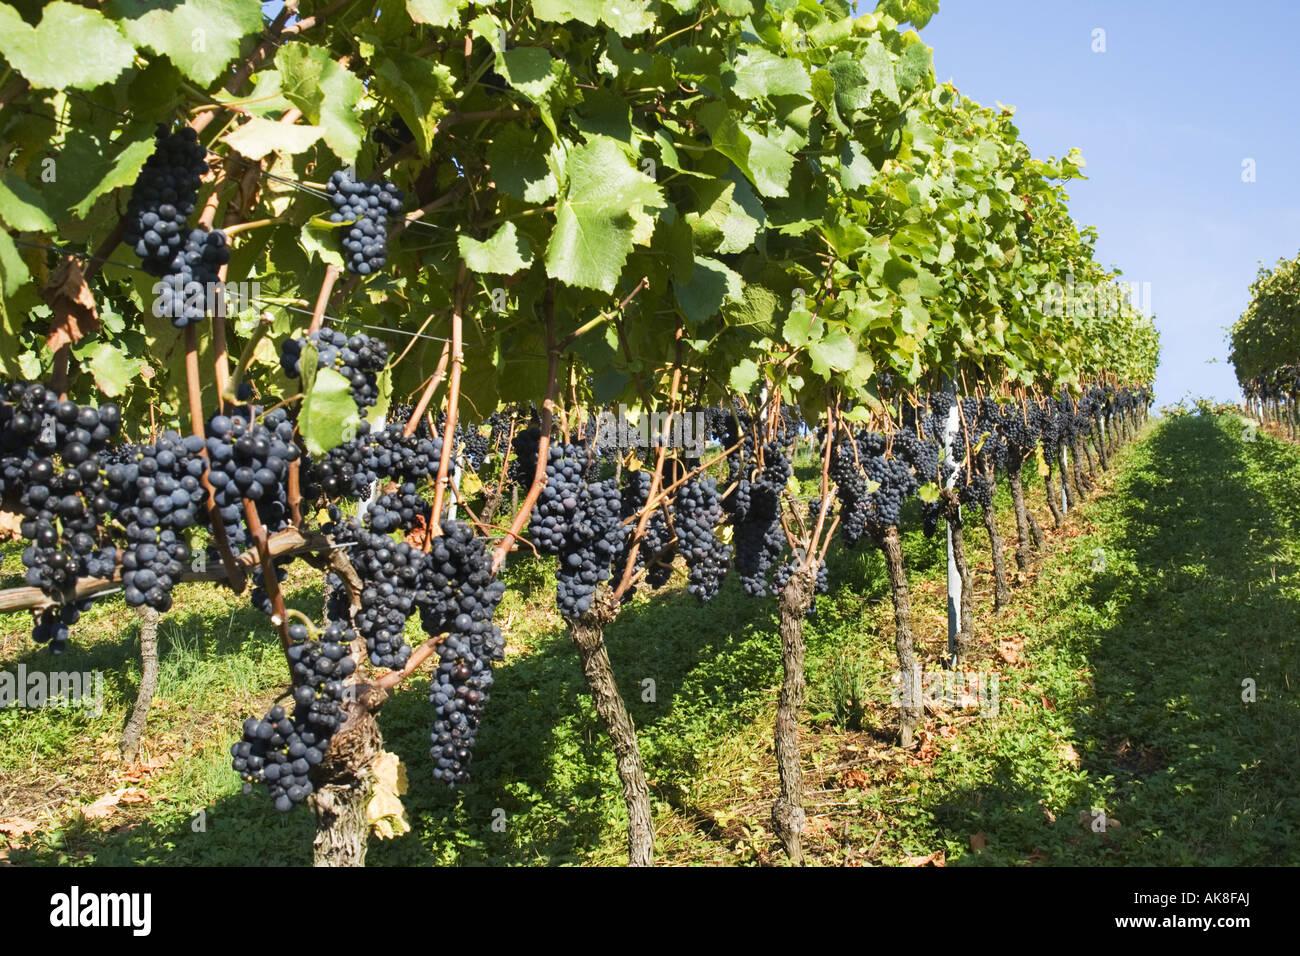 Gvine Vine Vitis Vinifera Cordon Of Vine With